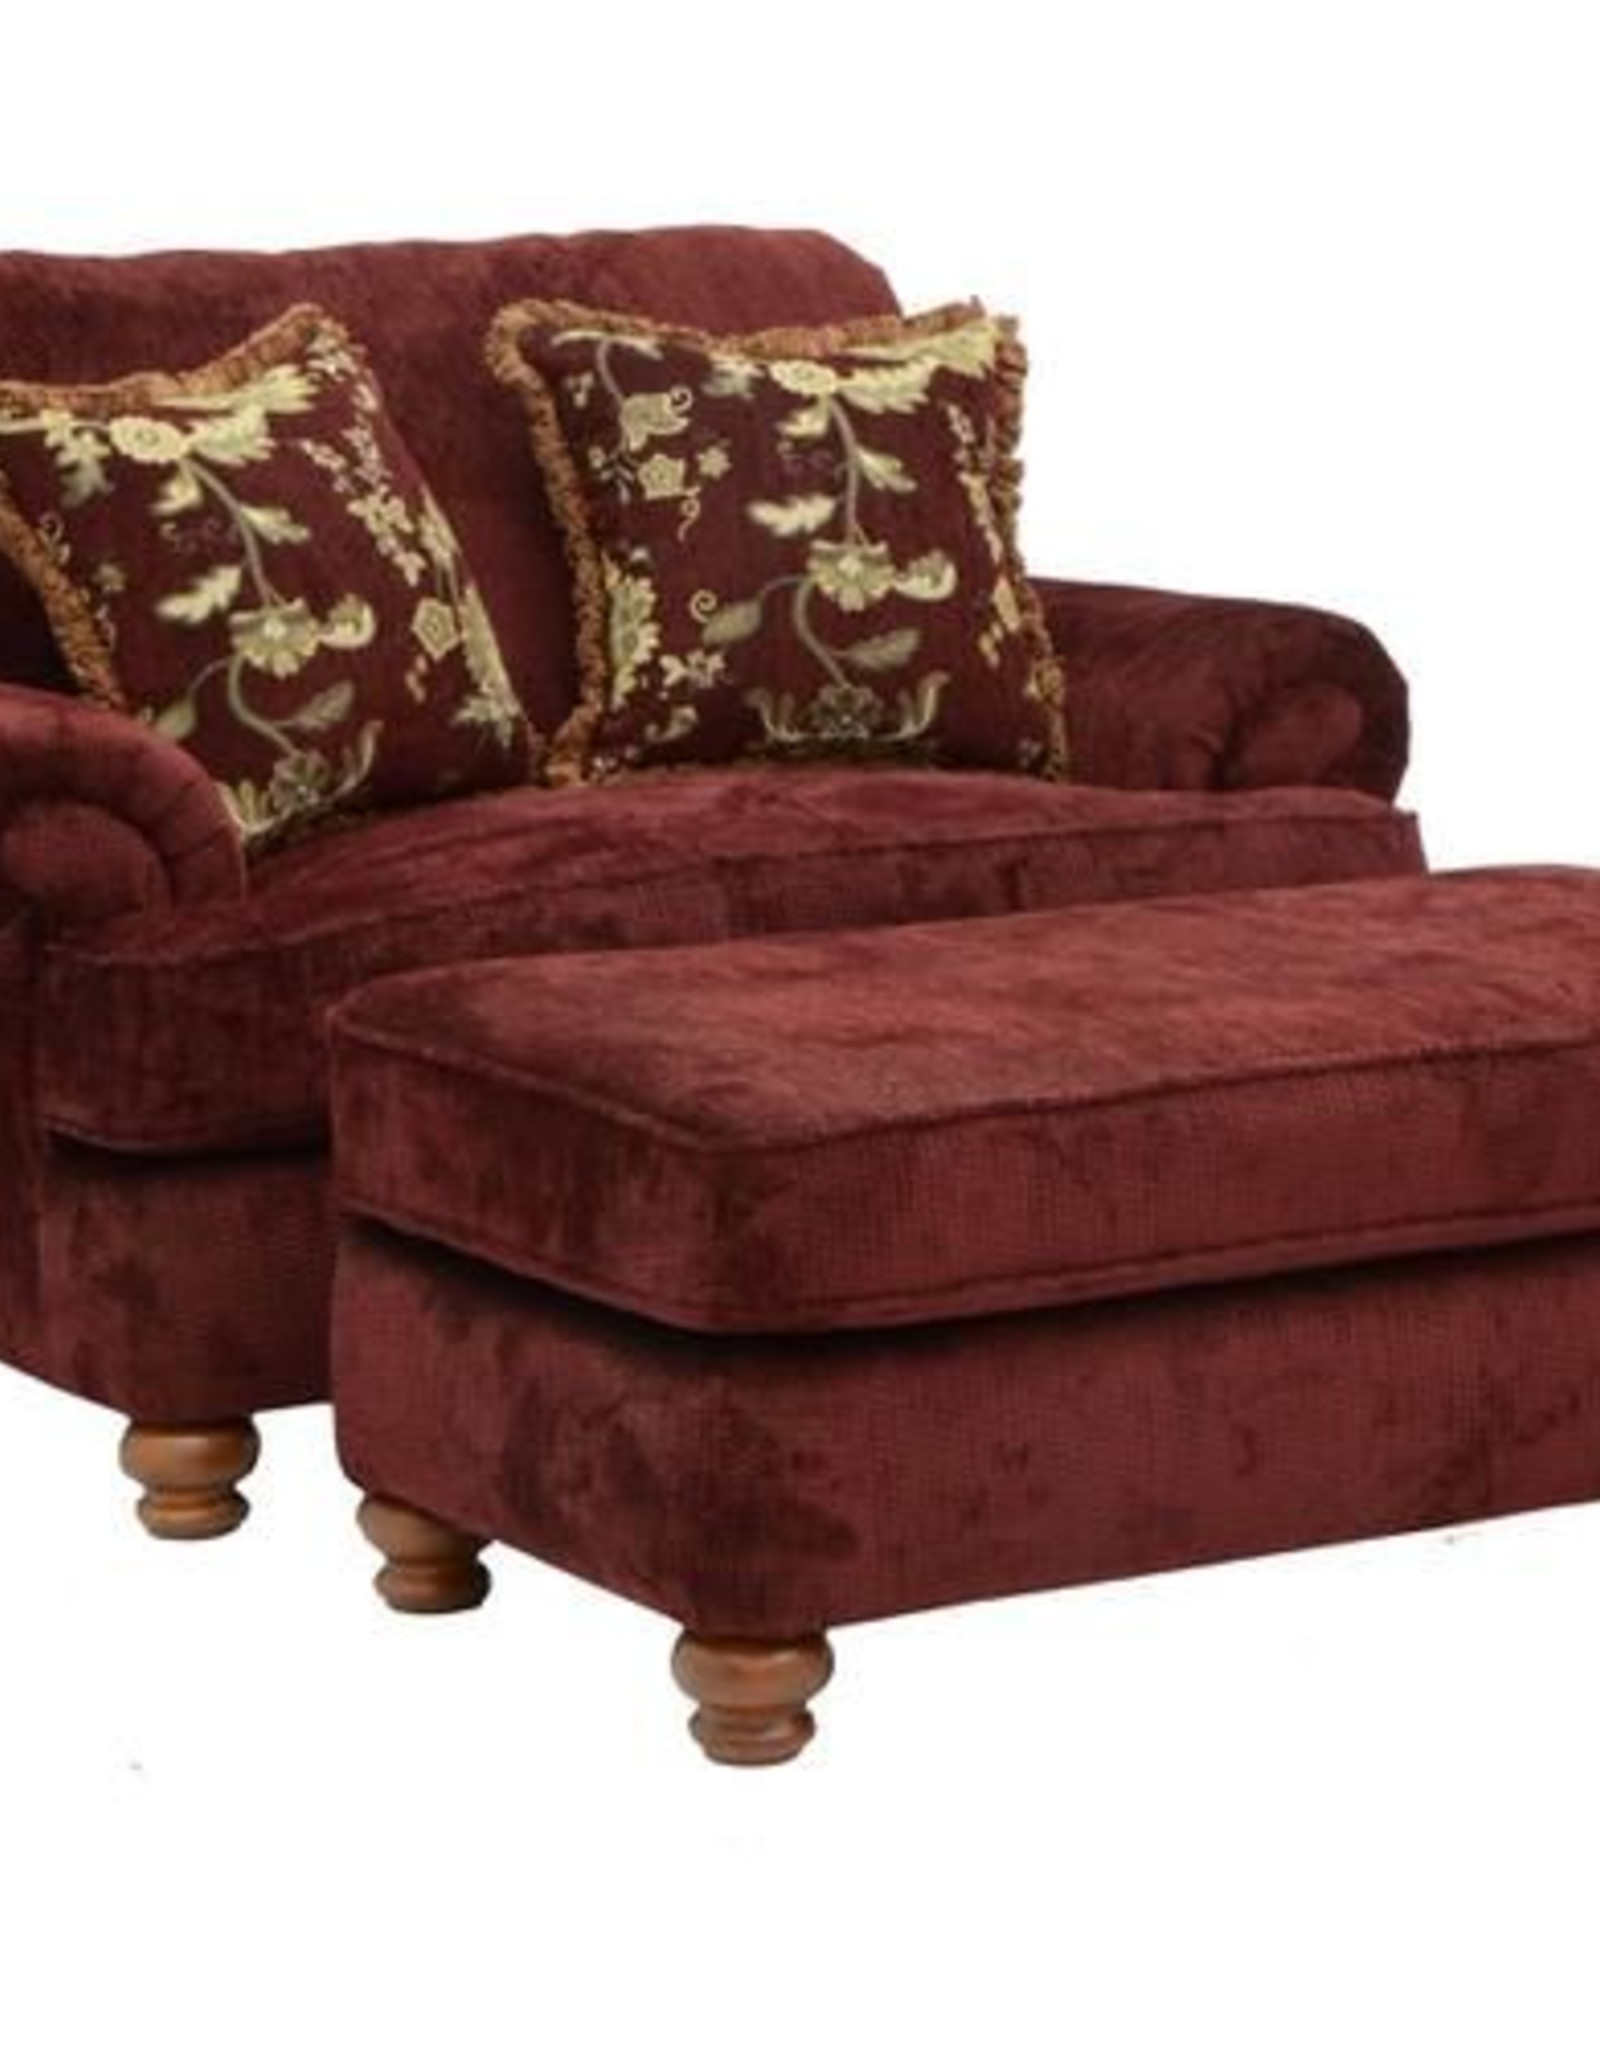 Jackson Catnapper Belmont Chair 1/2